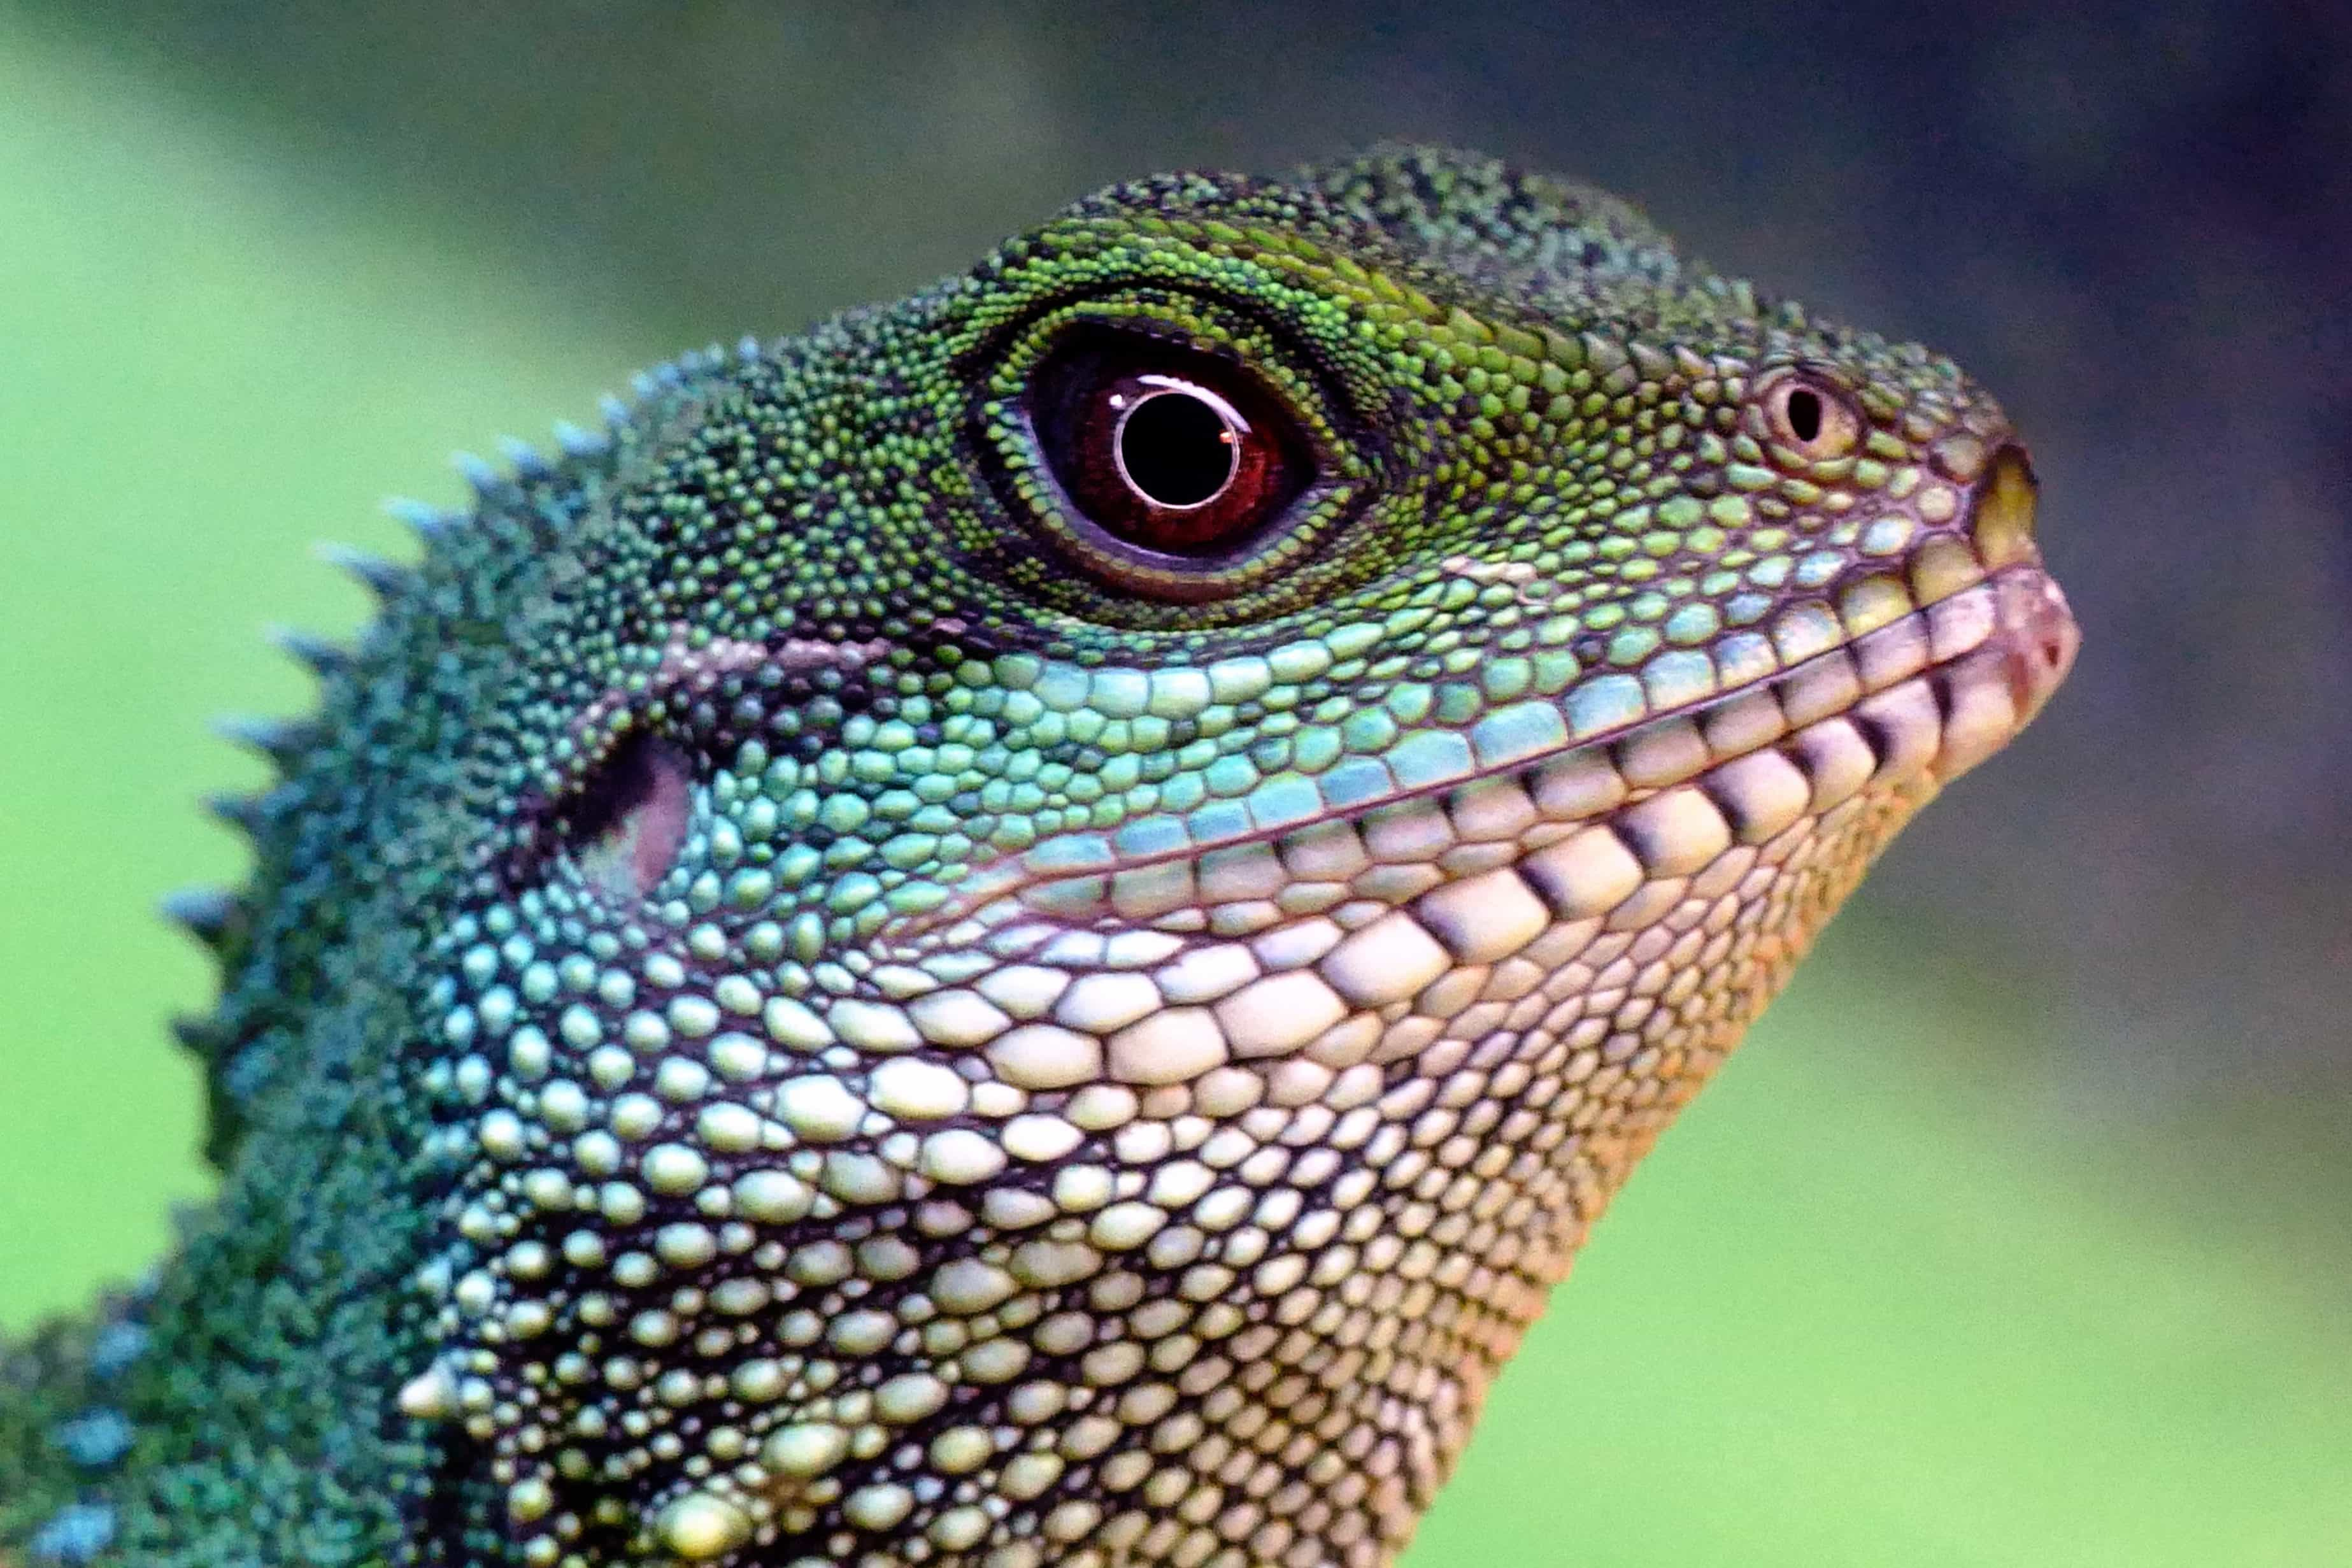 Free picture: lizard, reptile, wildlife, nature